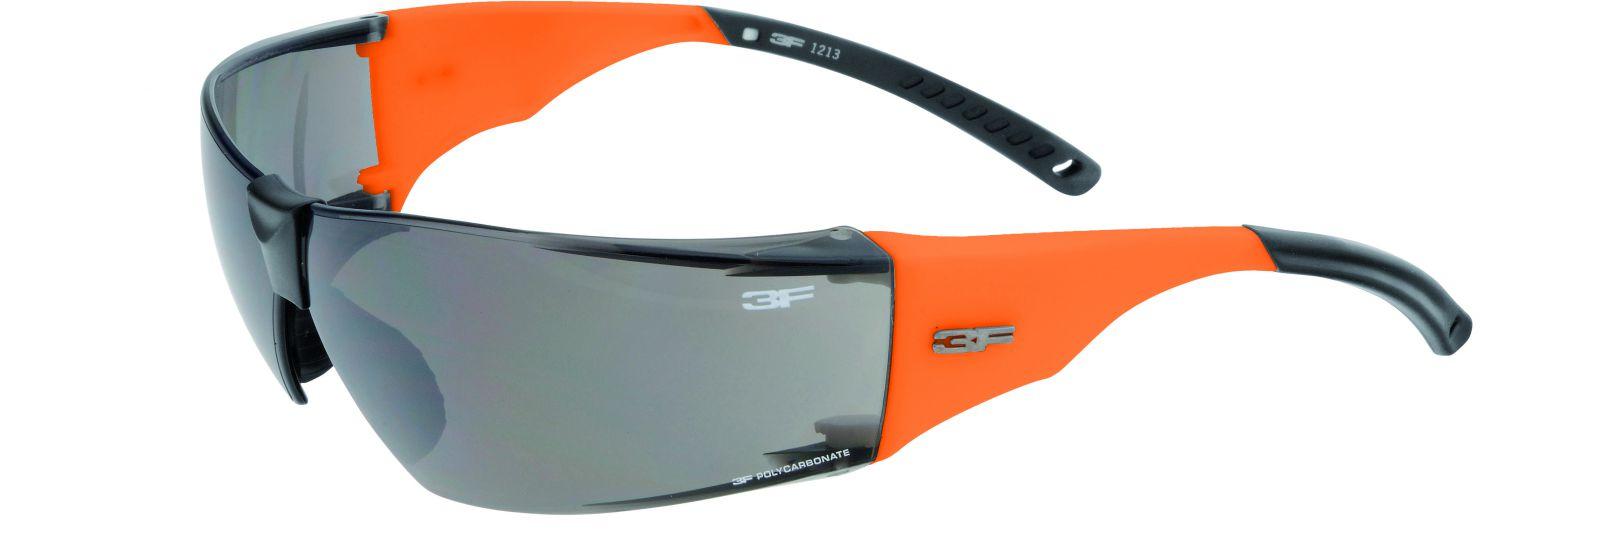 Cyklistické brýle 3F Mono II 1388